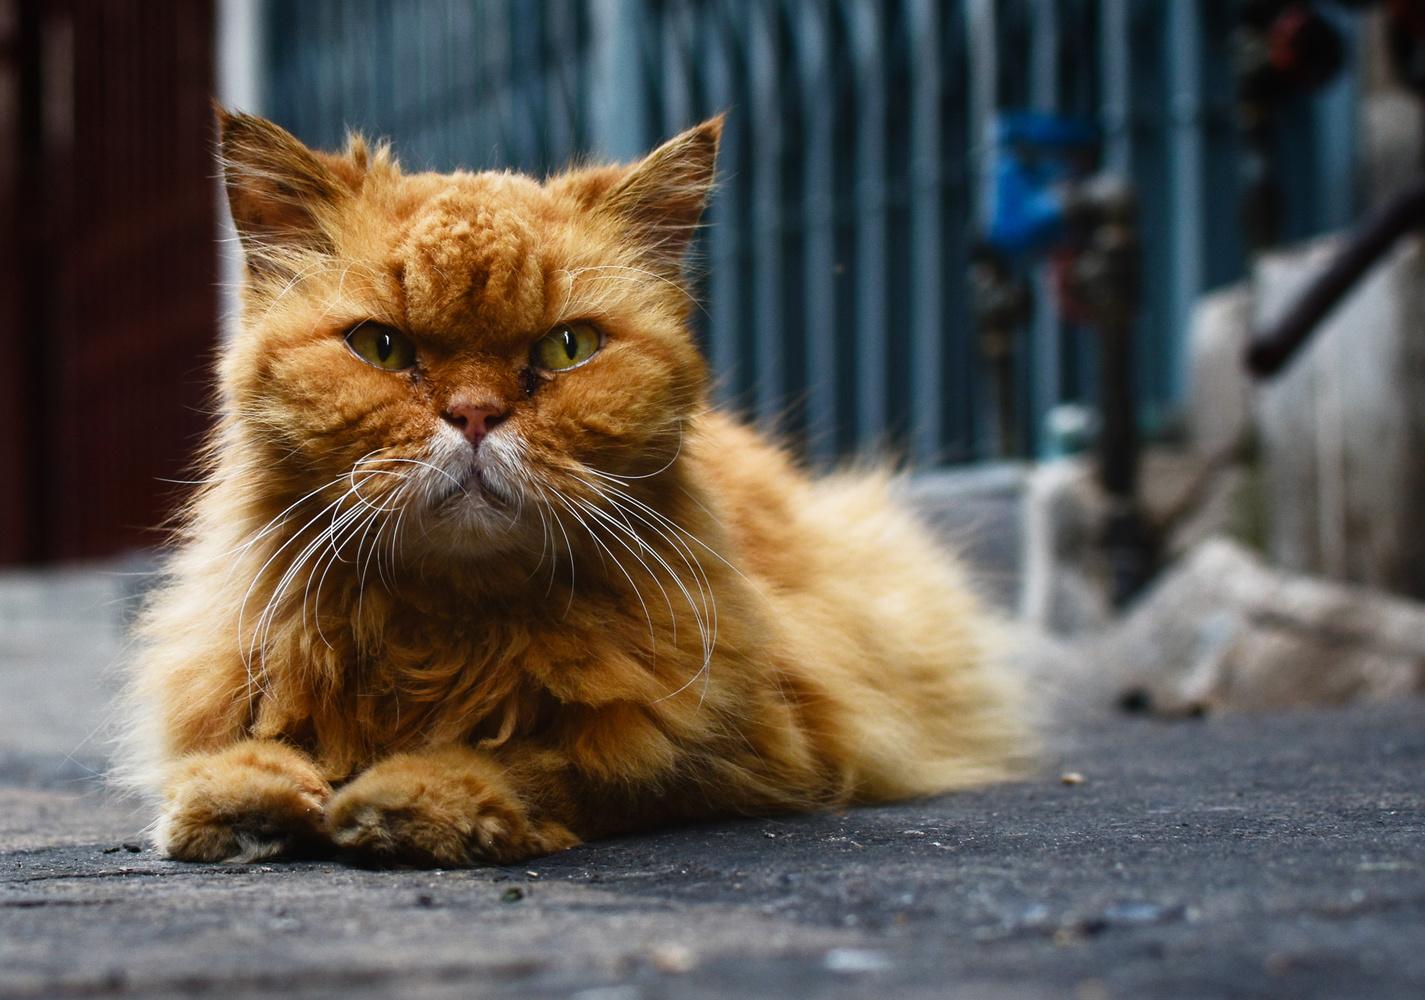 Garfield's Grandad by Will Ambeault